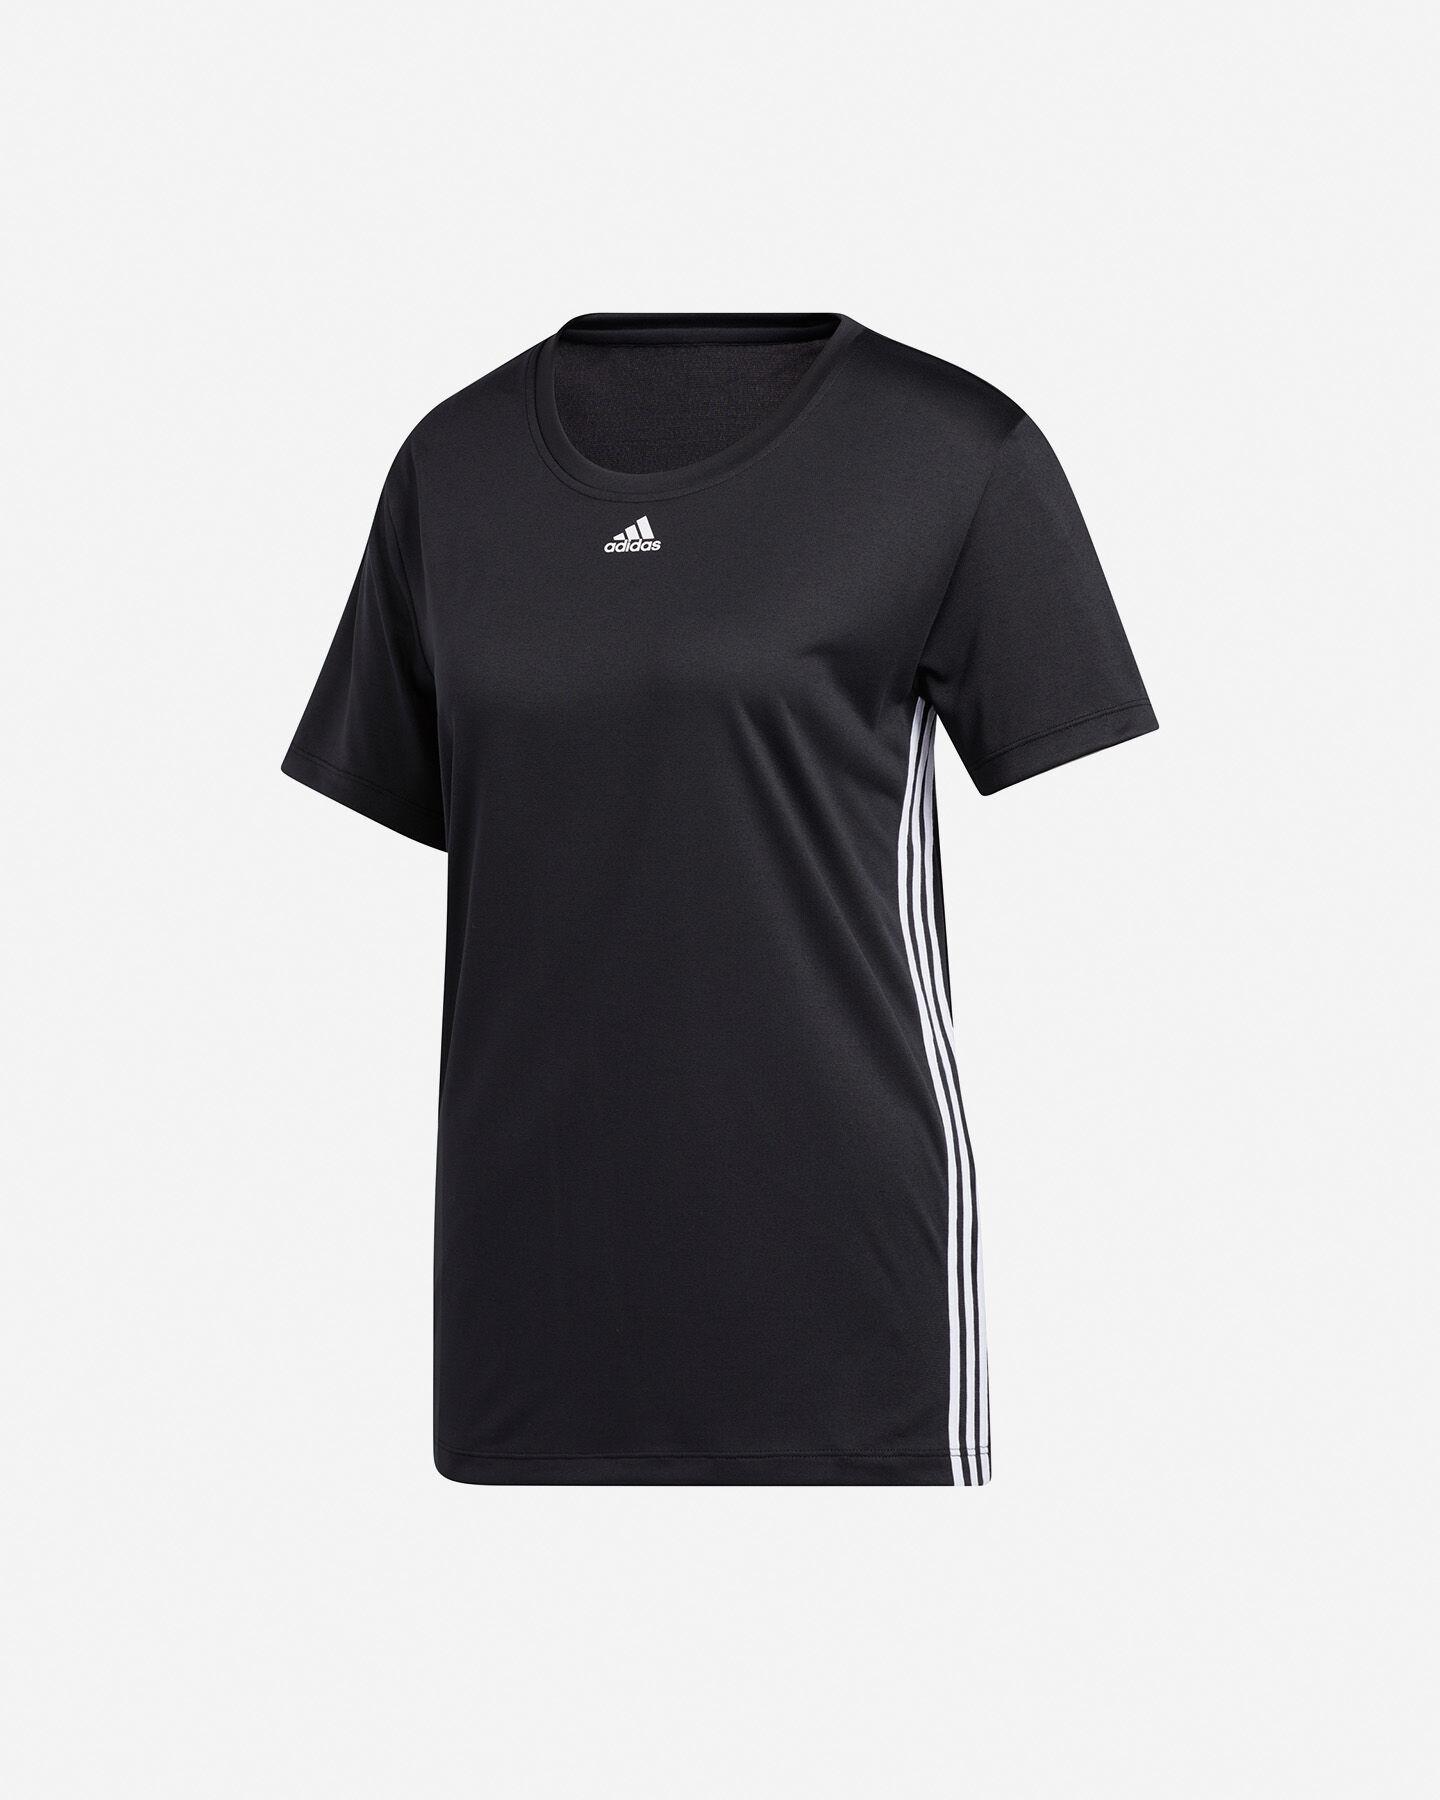 T-Shirt training ADIDAS 3 STRIPES W S5218163 scatto 0